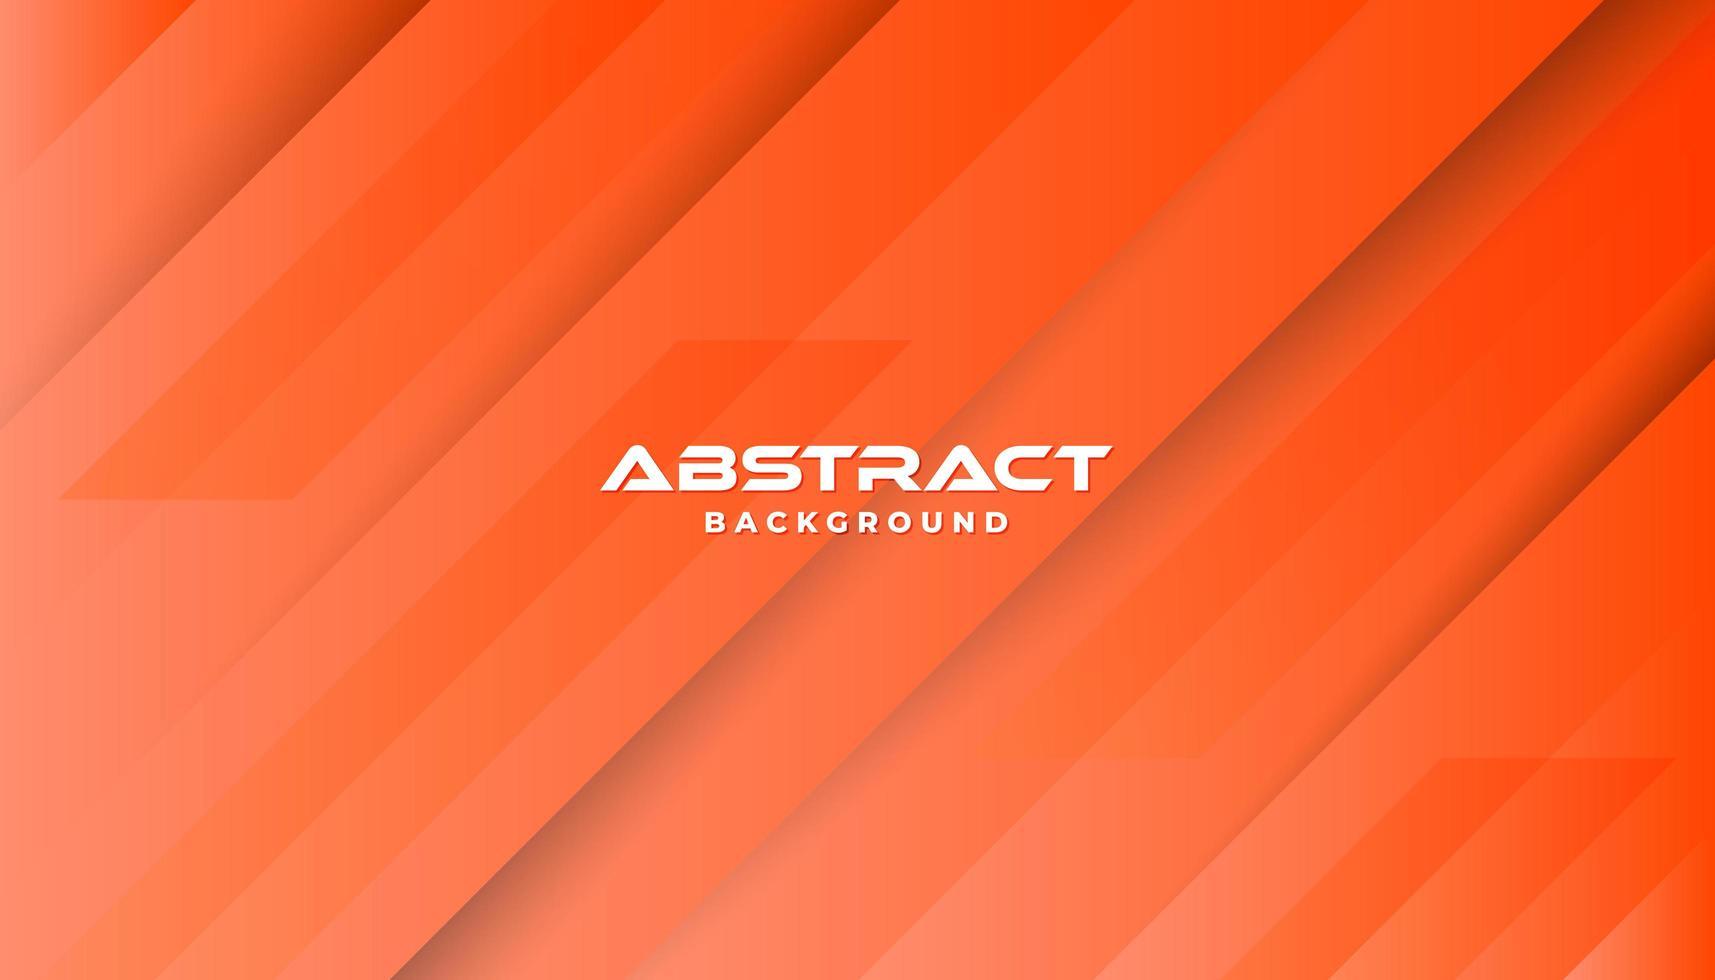 Capas 3d fondo naranja formas diagonales vector